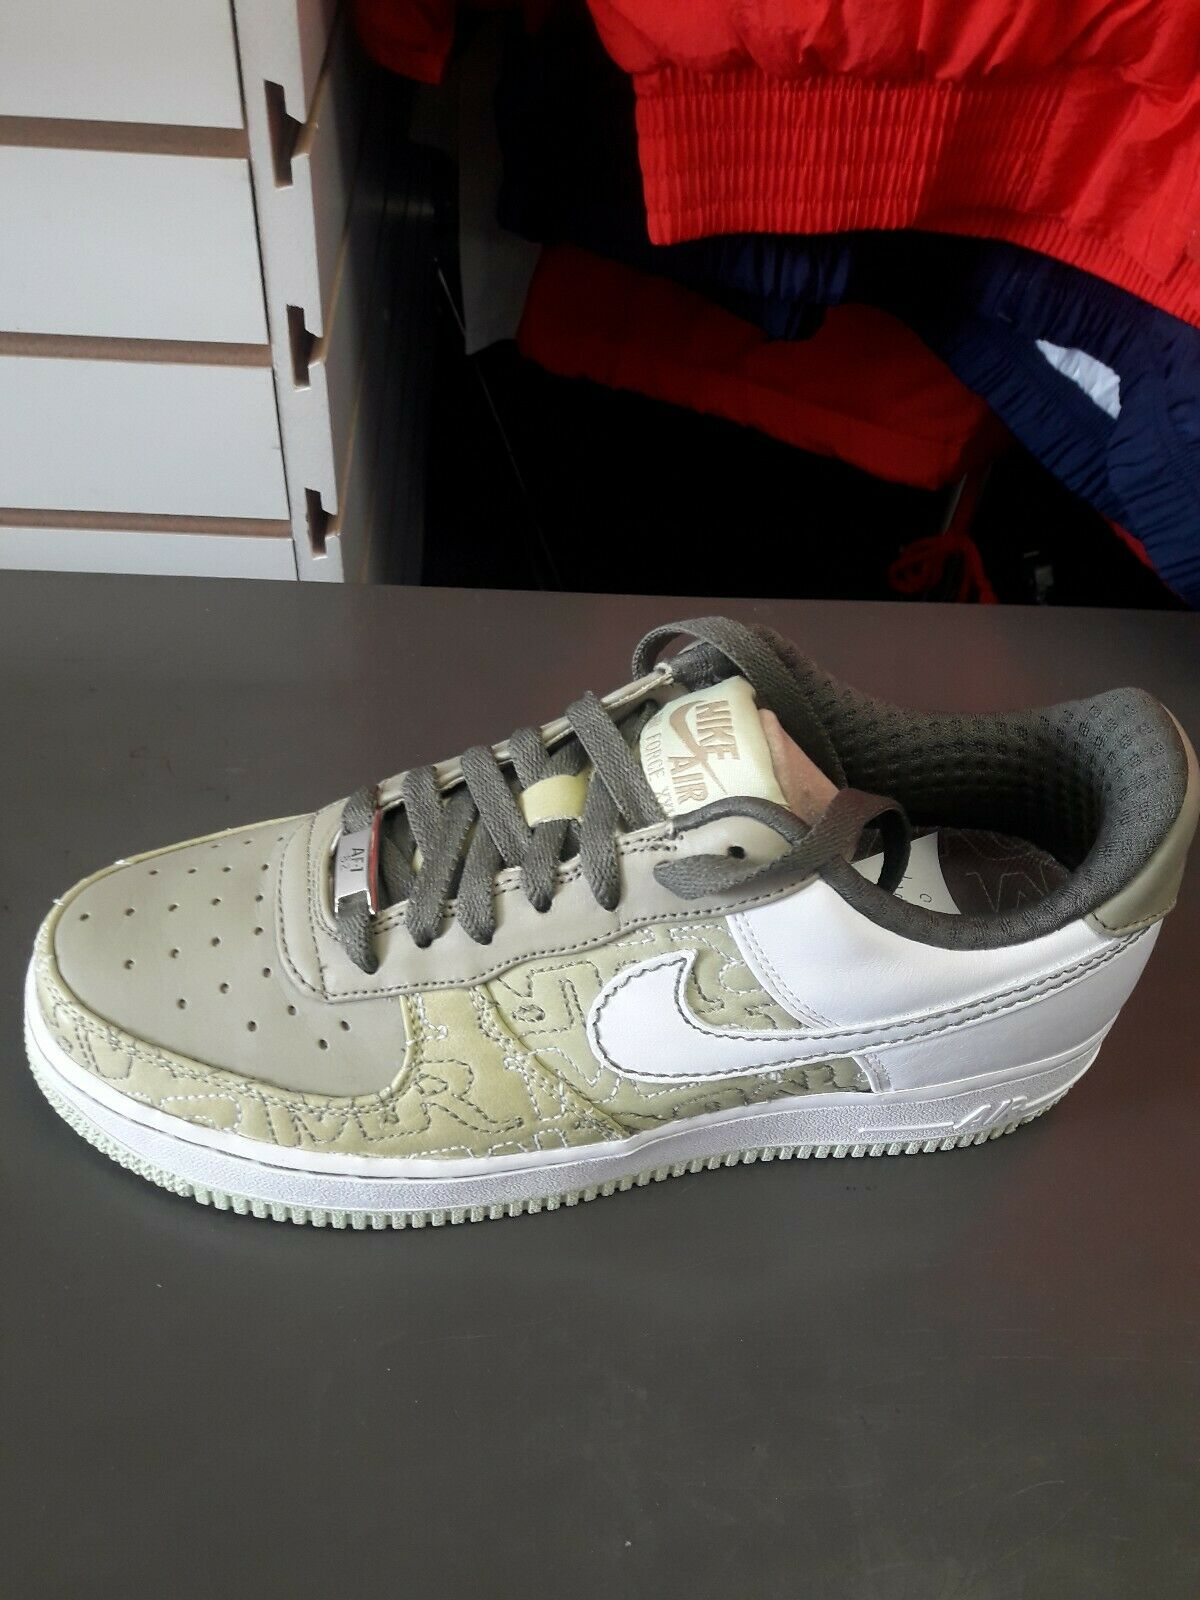 Nike Air Force 1 låg högsta kvinnor Storlek 8.5 skor